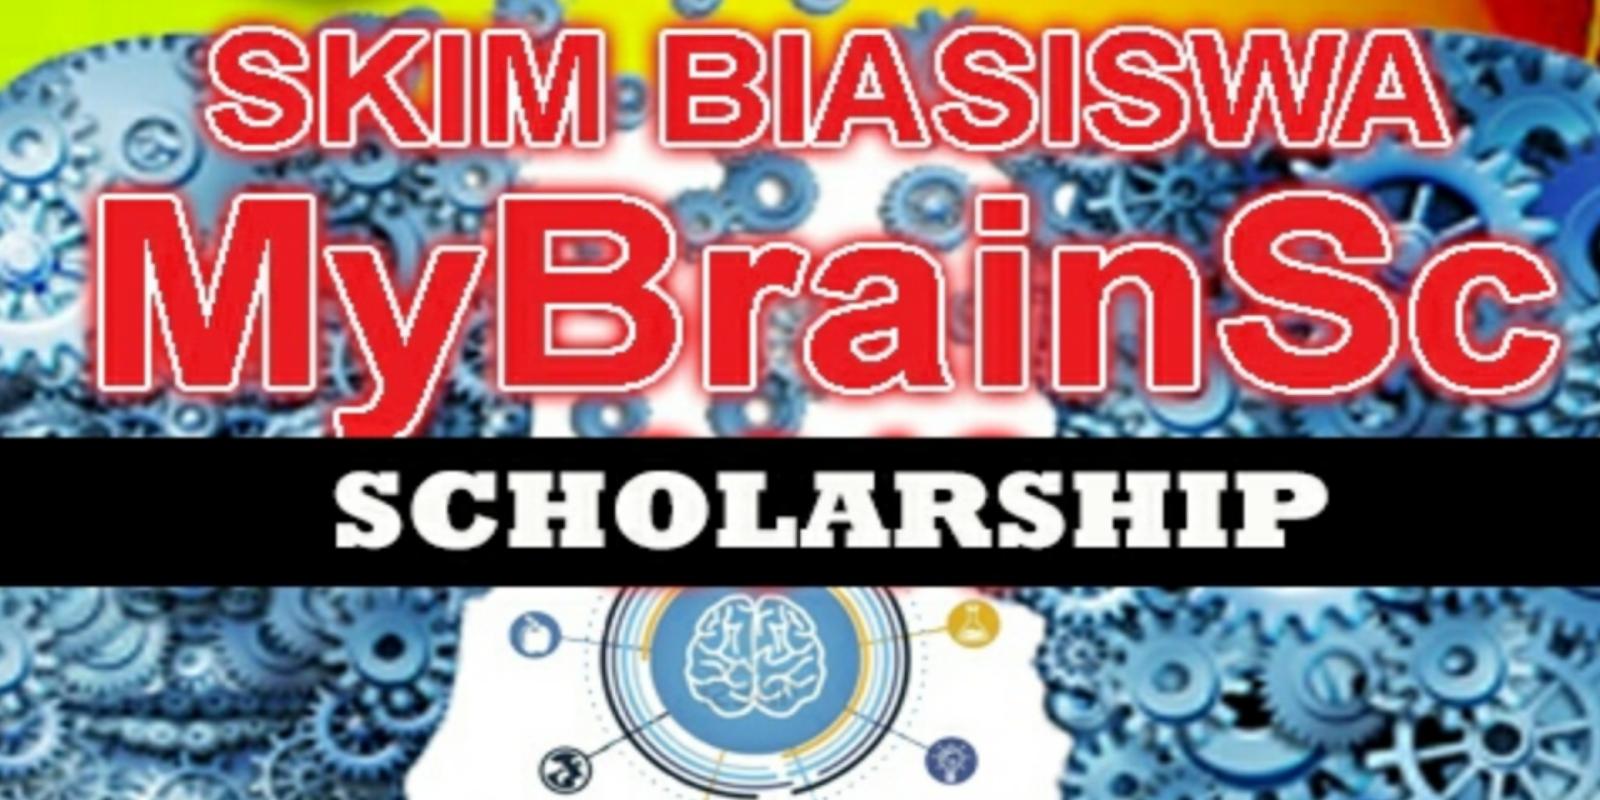 Permohonan Biasiswa MyBrainSc KPT 2019 Online